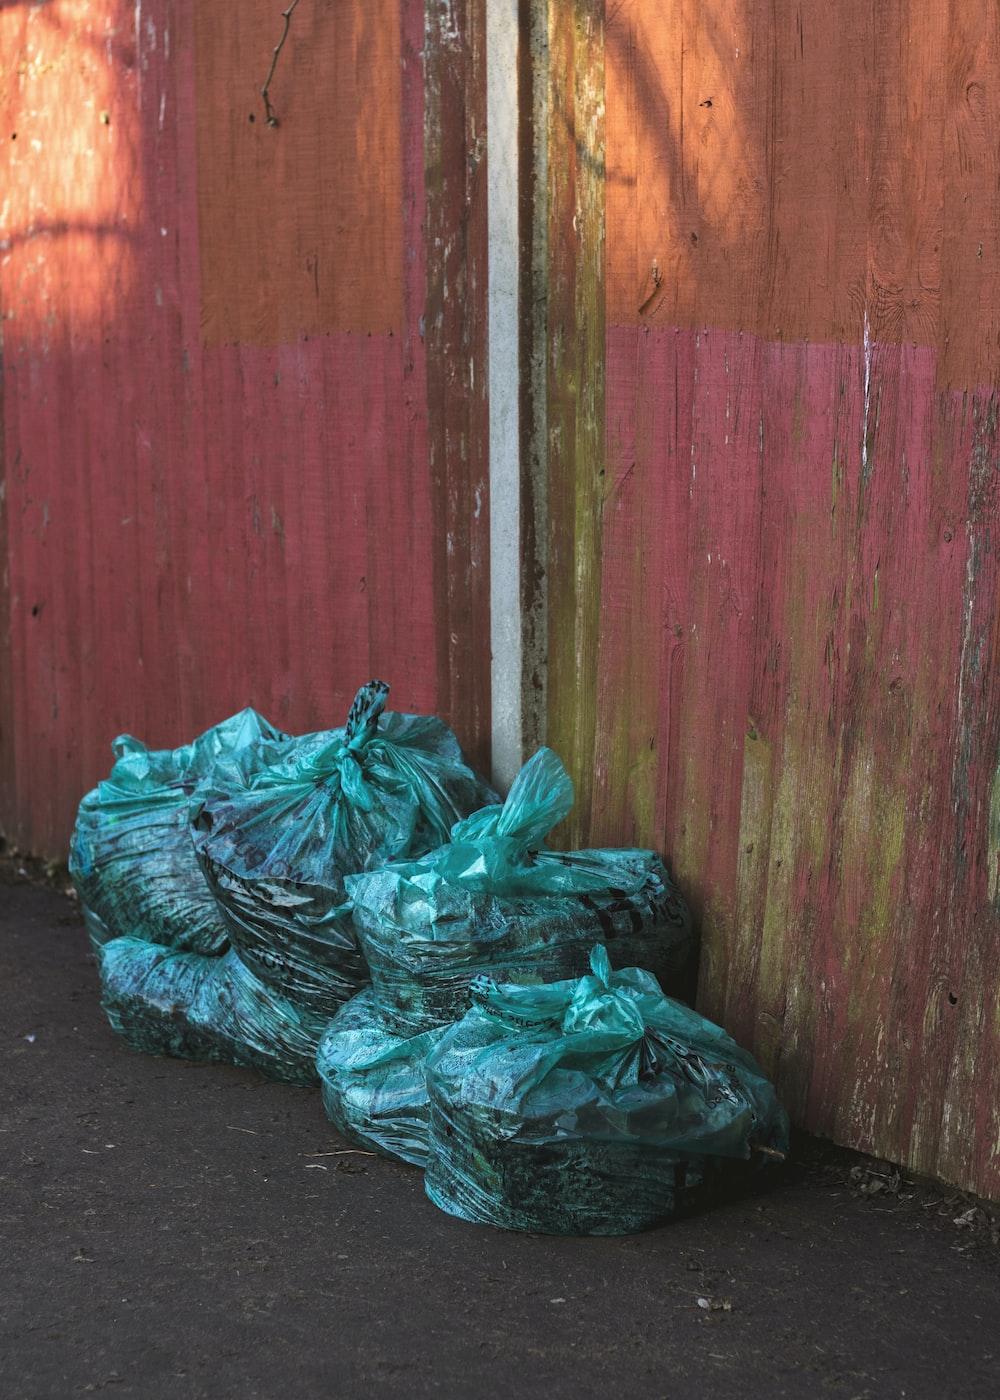 green plastic bags near wooden wall